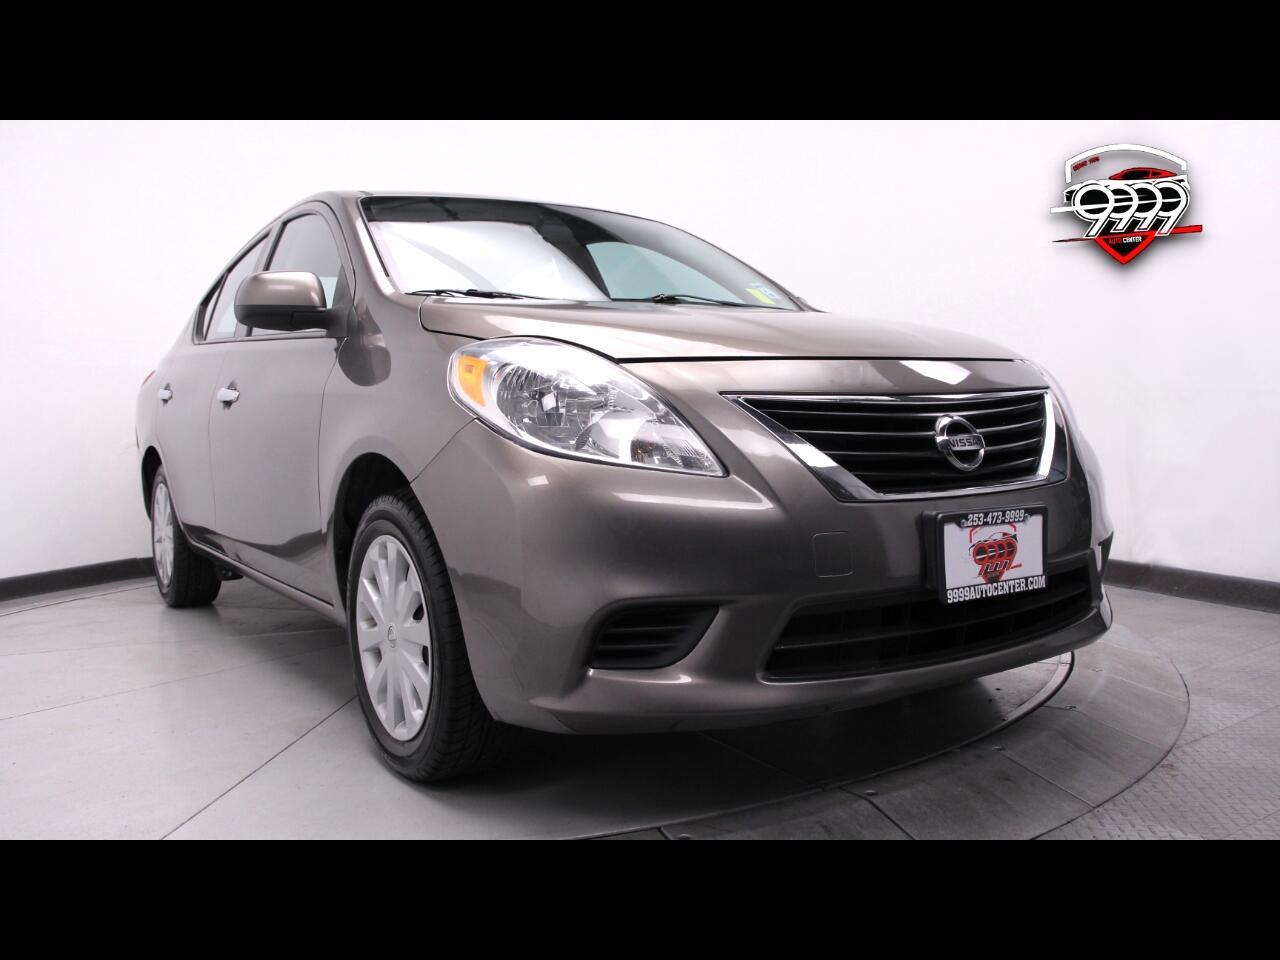 Nissan Versa 1.6 S 5M 2014